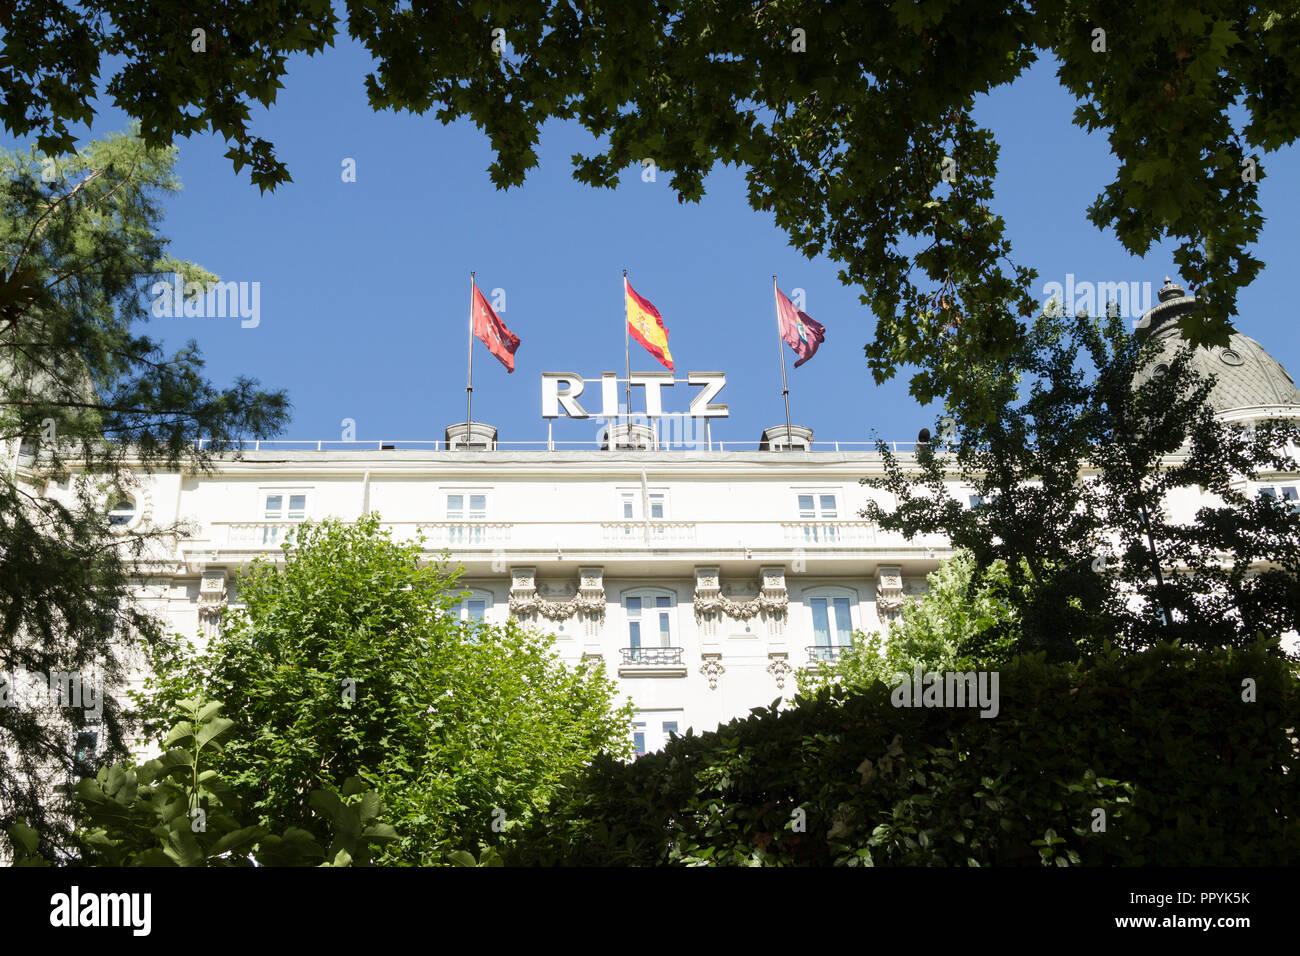 Ritz Hotel, Madrid, Spain - Stock Image